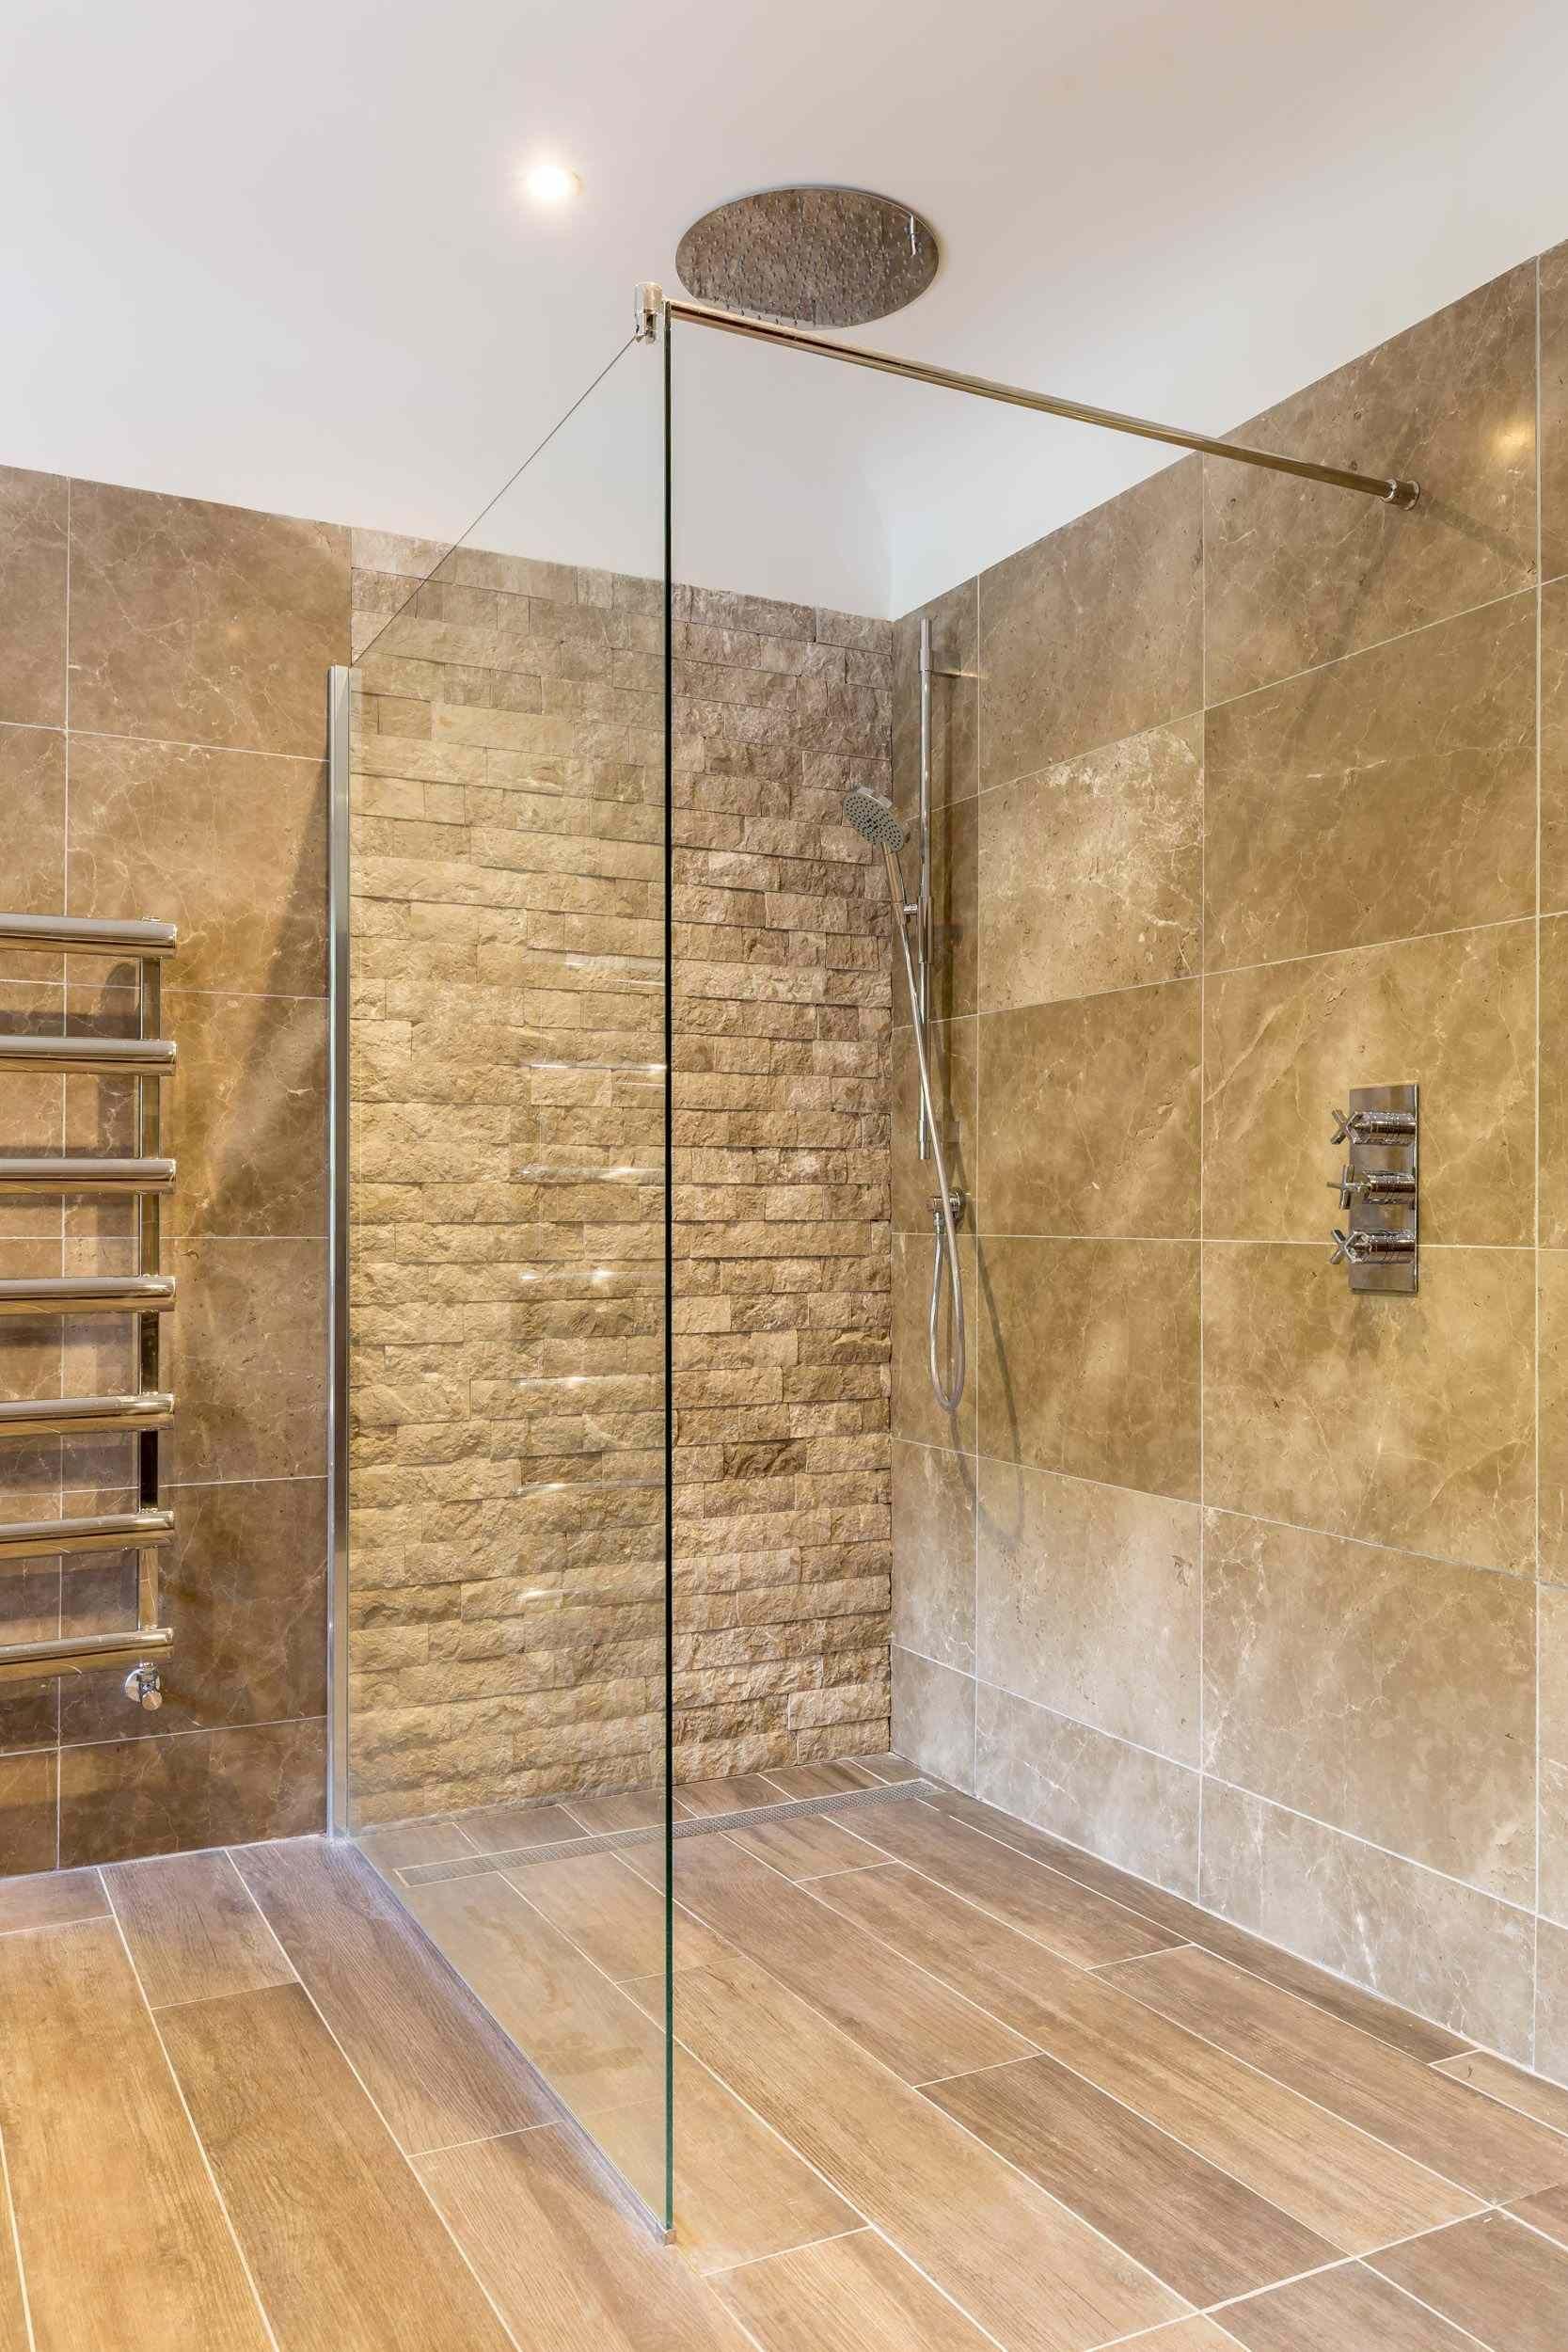 39 Contemporary Hallway Tiles Shower Tile Contemporary Hallway Wall Tiles